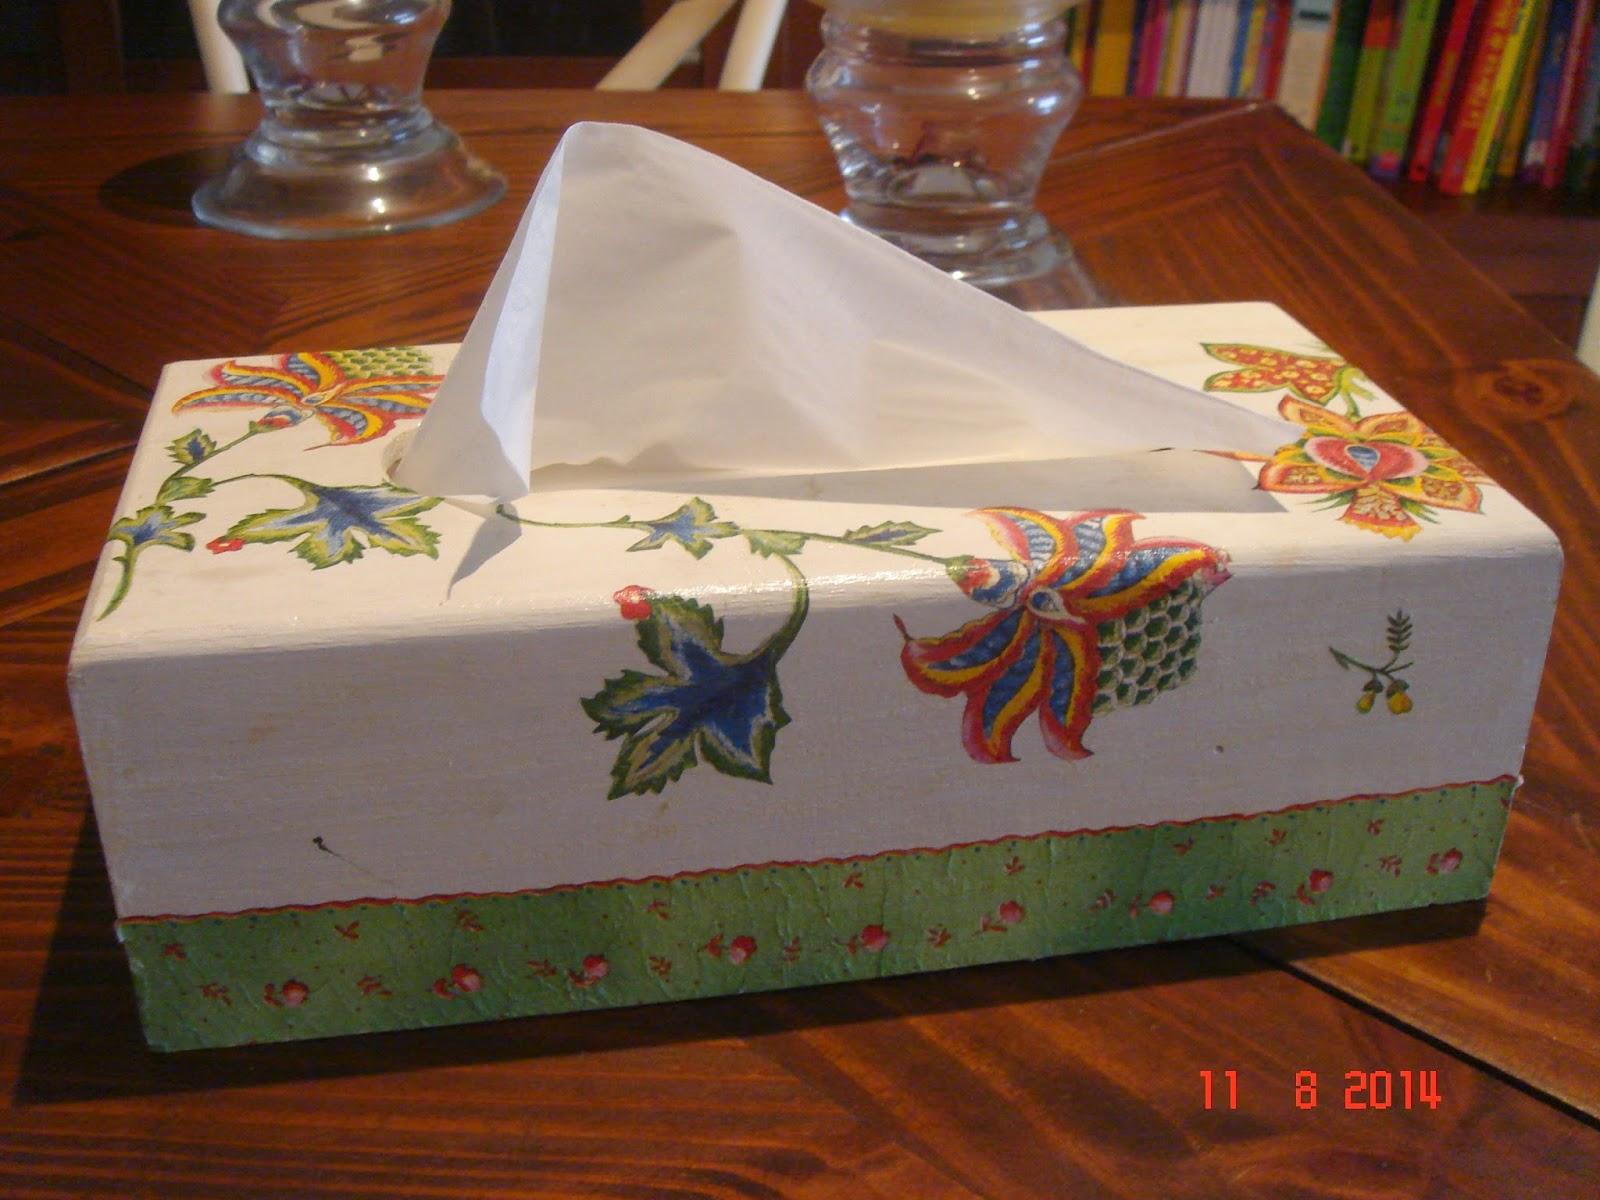 La casa del parotet caixa de mocadors - Casas embargadas la caixa ...